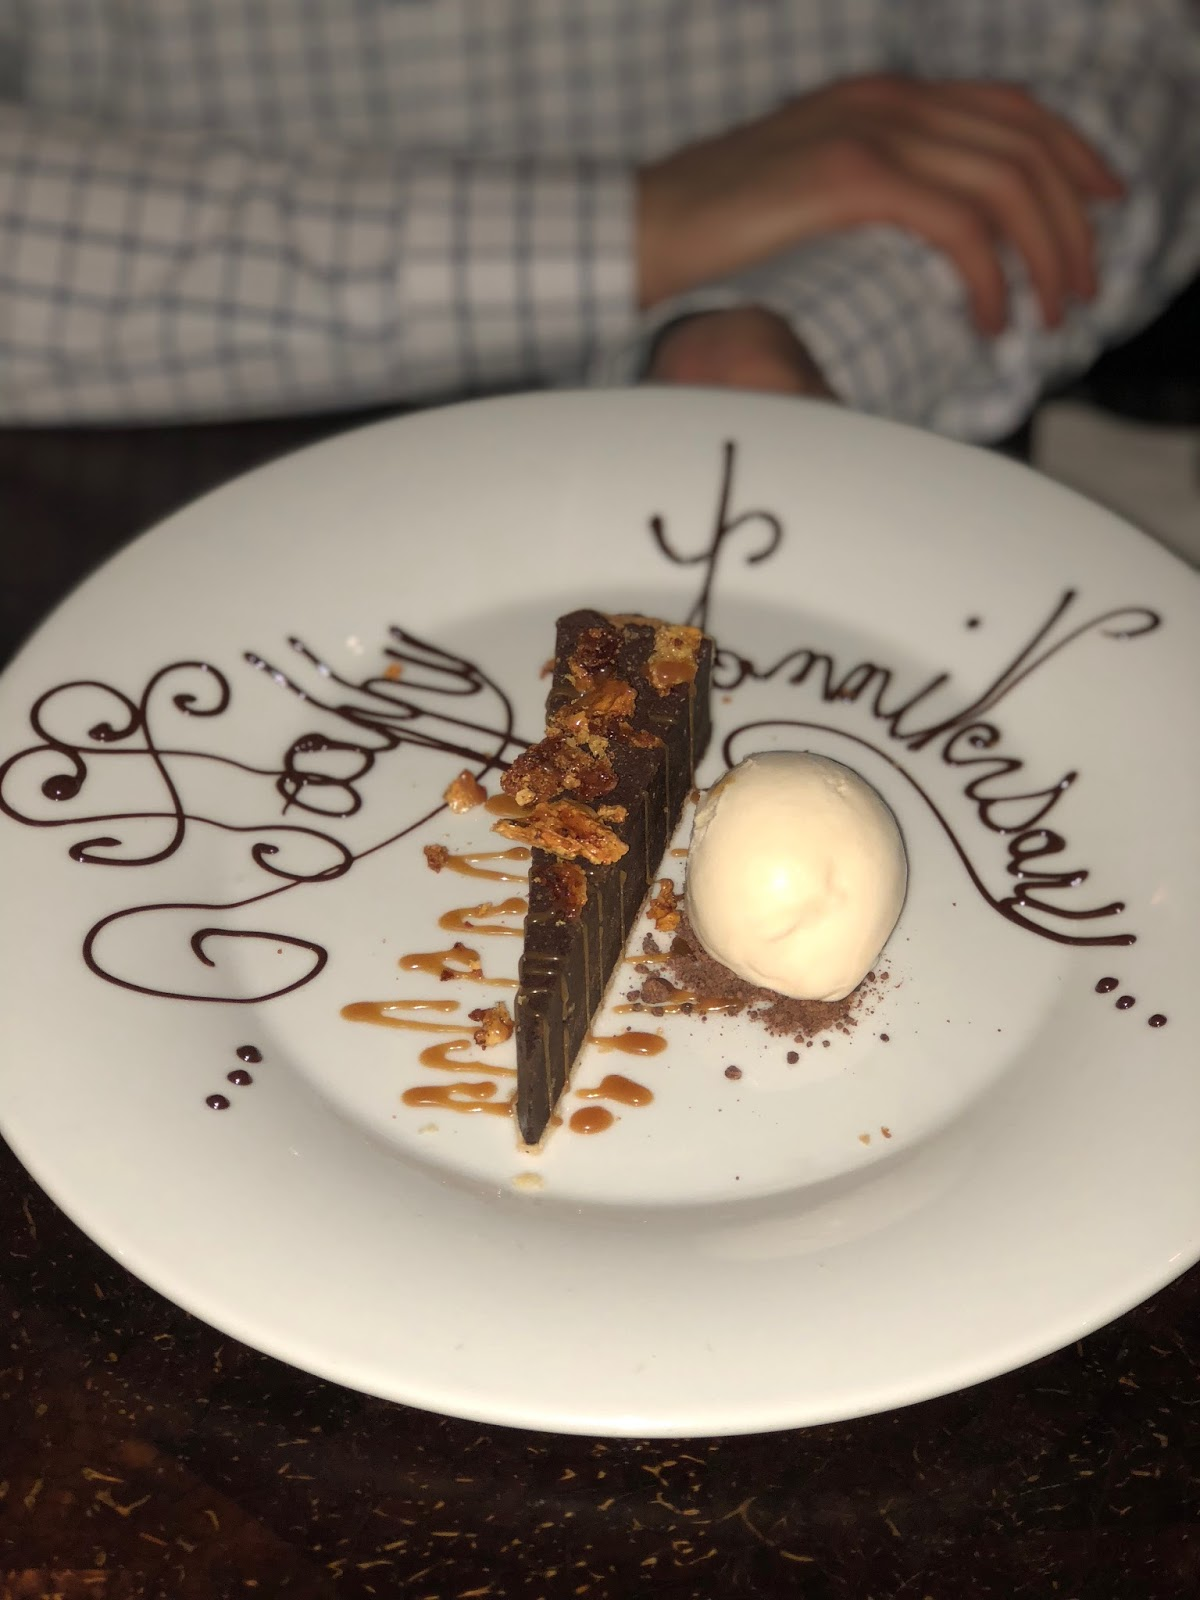 Where to eat in dubin, places to dine in dublin, upscale restaurant dublin, wine bar dublin